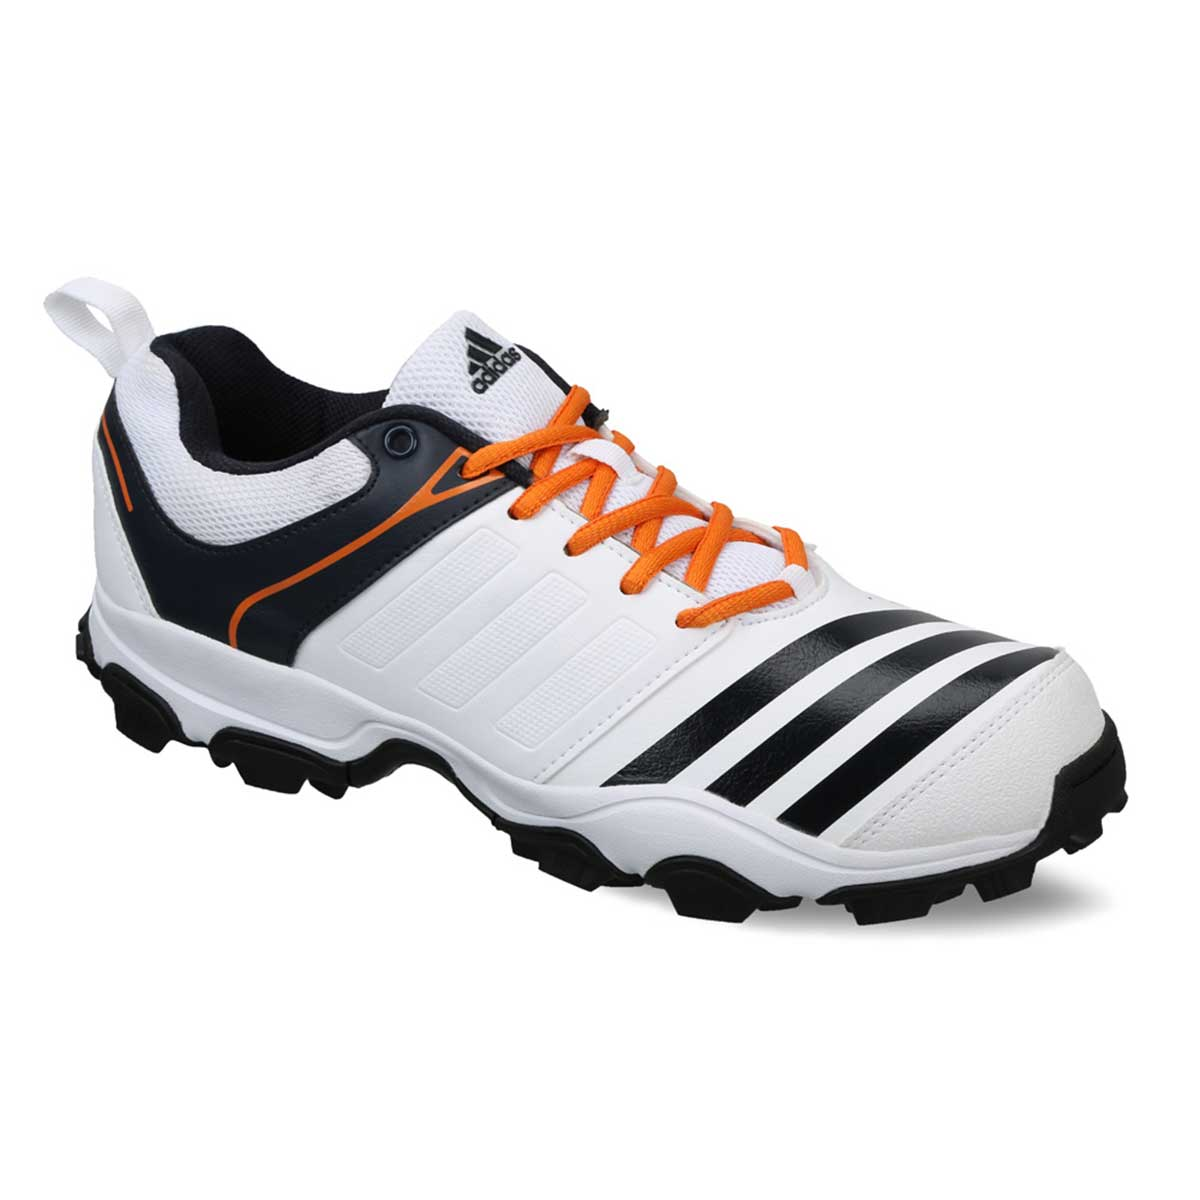 Buy Adidas 22 Yards Trainer 16 Low